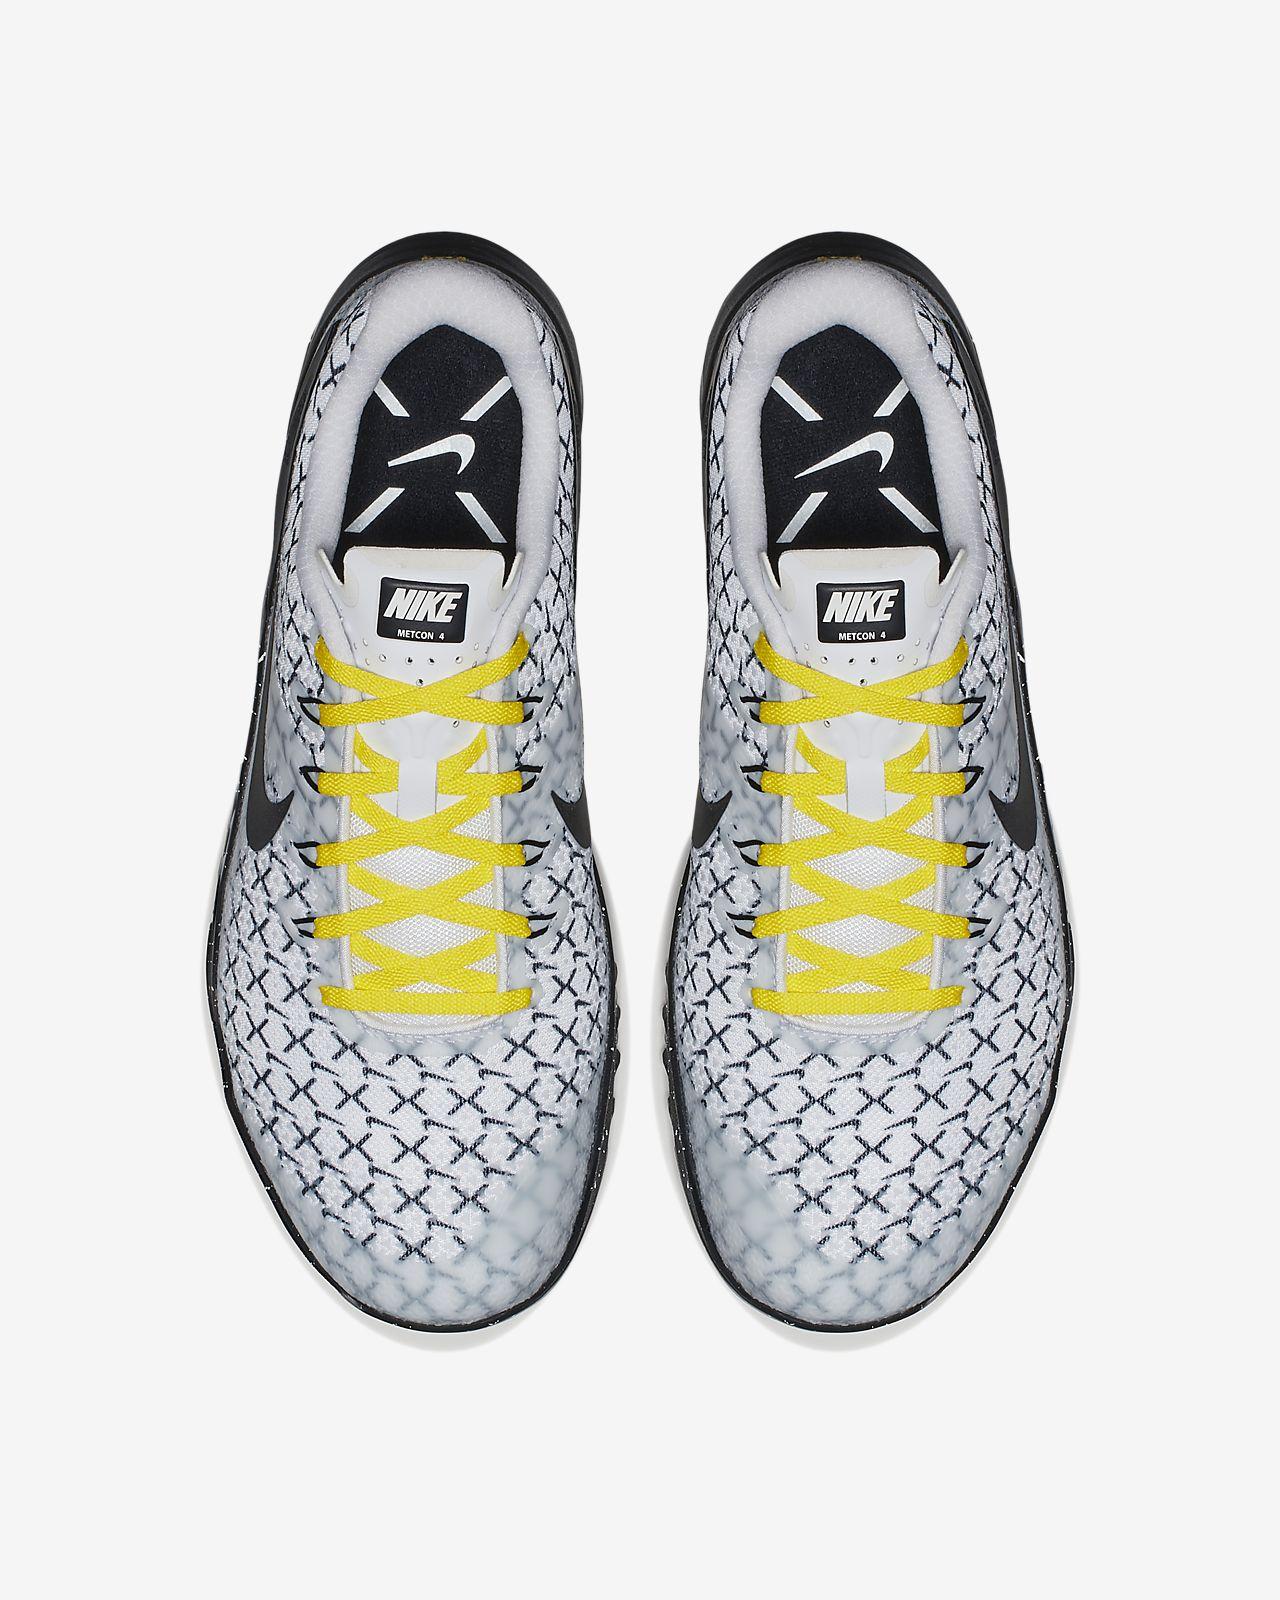 new product 197f4 160b2 scarpa da cross-trainingsollevamento pesi nike metcon 4 x biancodynamic  yellownero ao2806-107